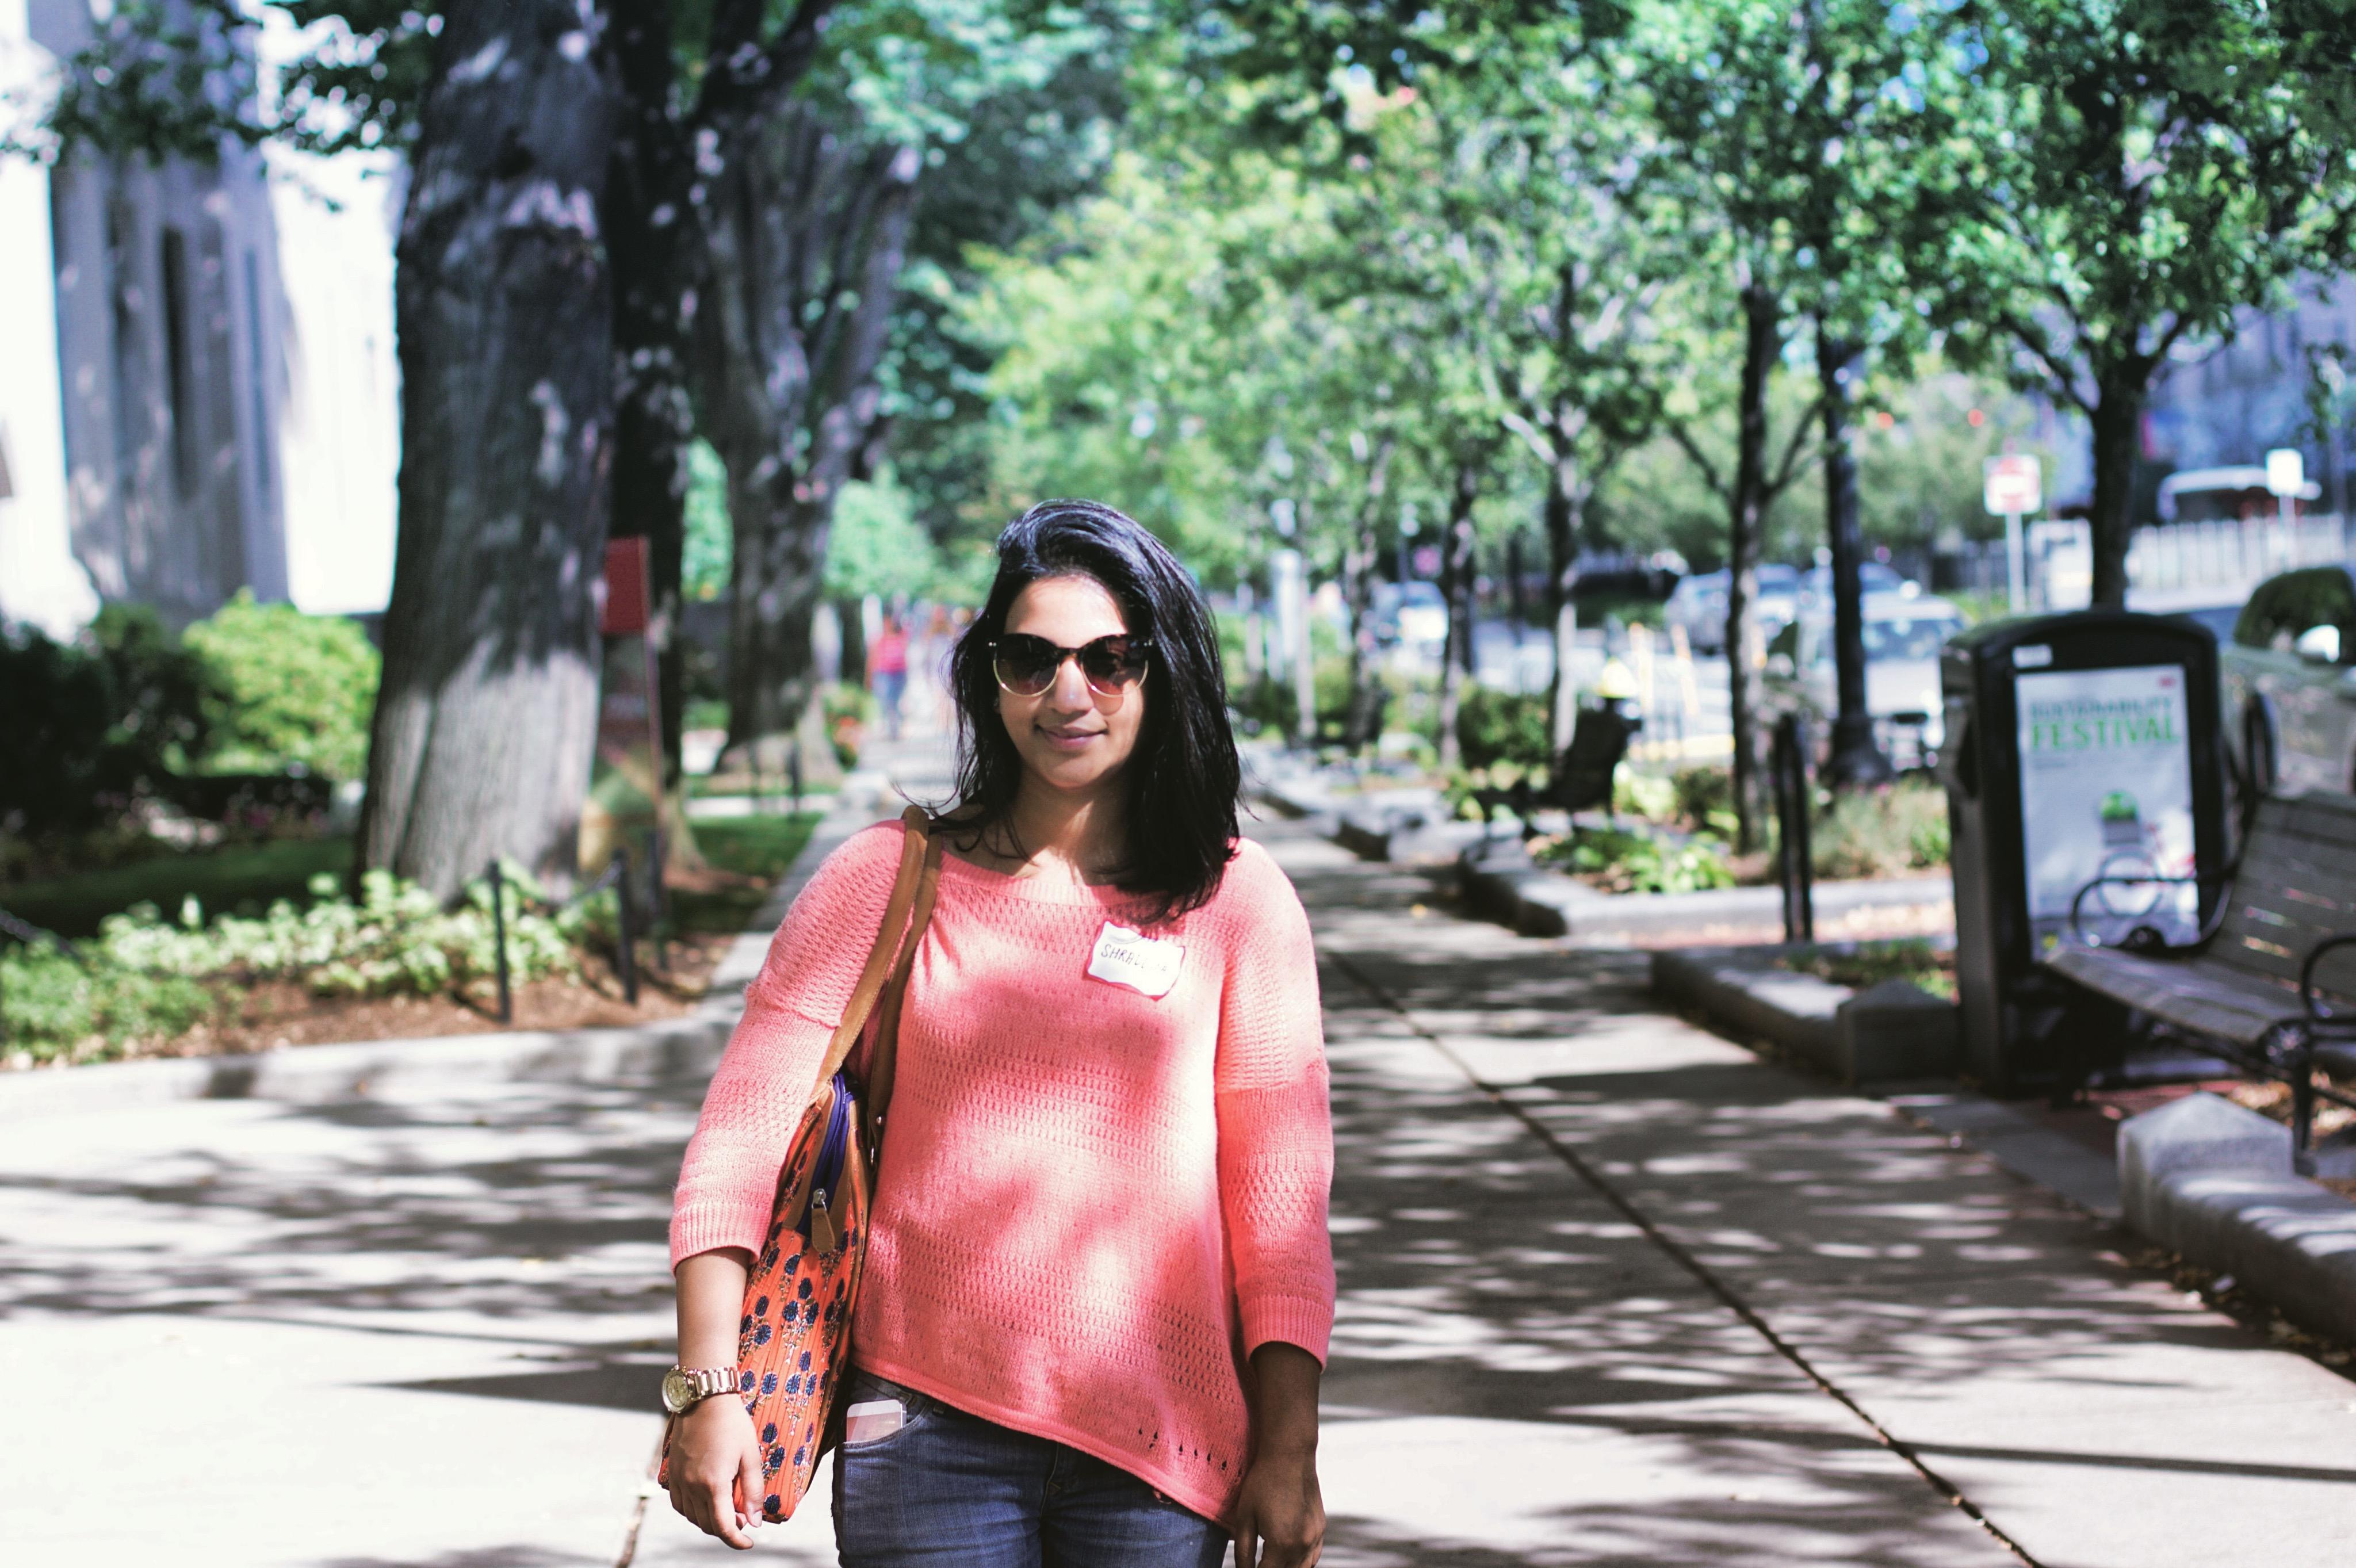 streettrotter - #threadcasa fashion bag